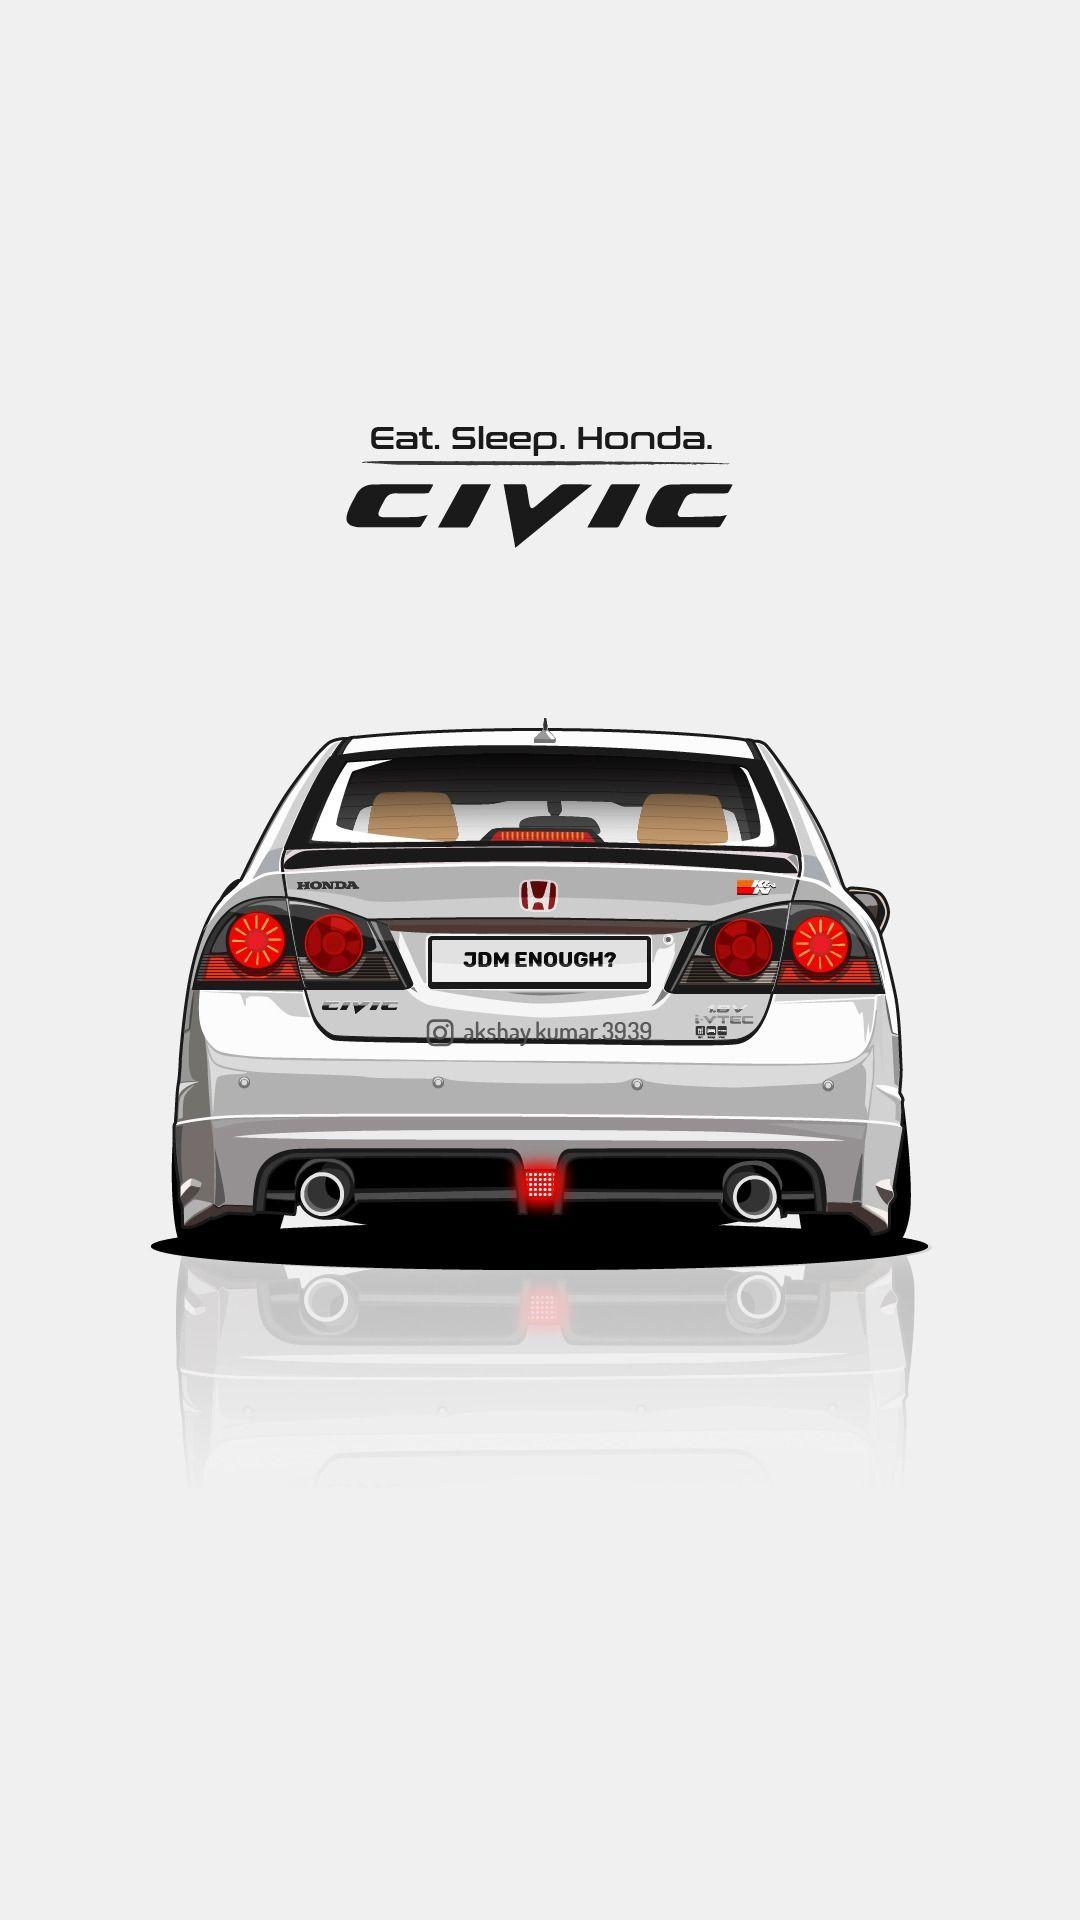 Eat Sleep Honda Civic Wallpaper Indian Cars Wallpaper Jdm Wallpaper Honda Civic Type R Mobil Modifikasi Mobil Balap Mobil Sport